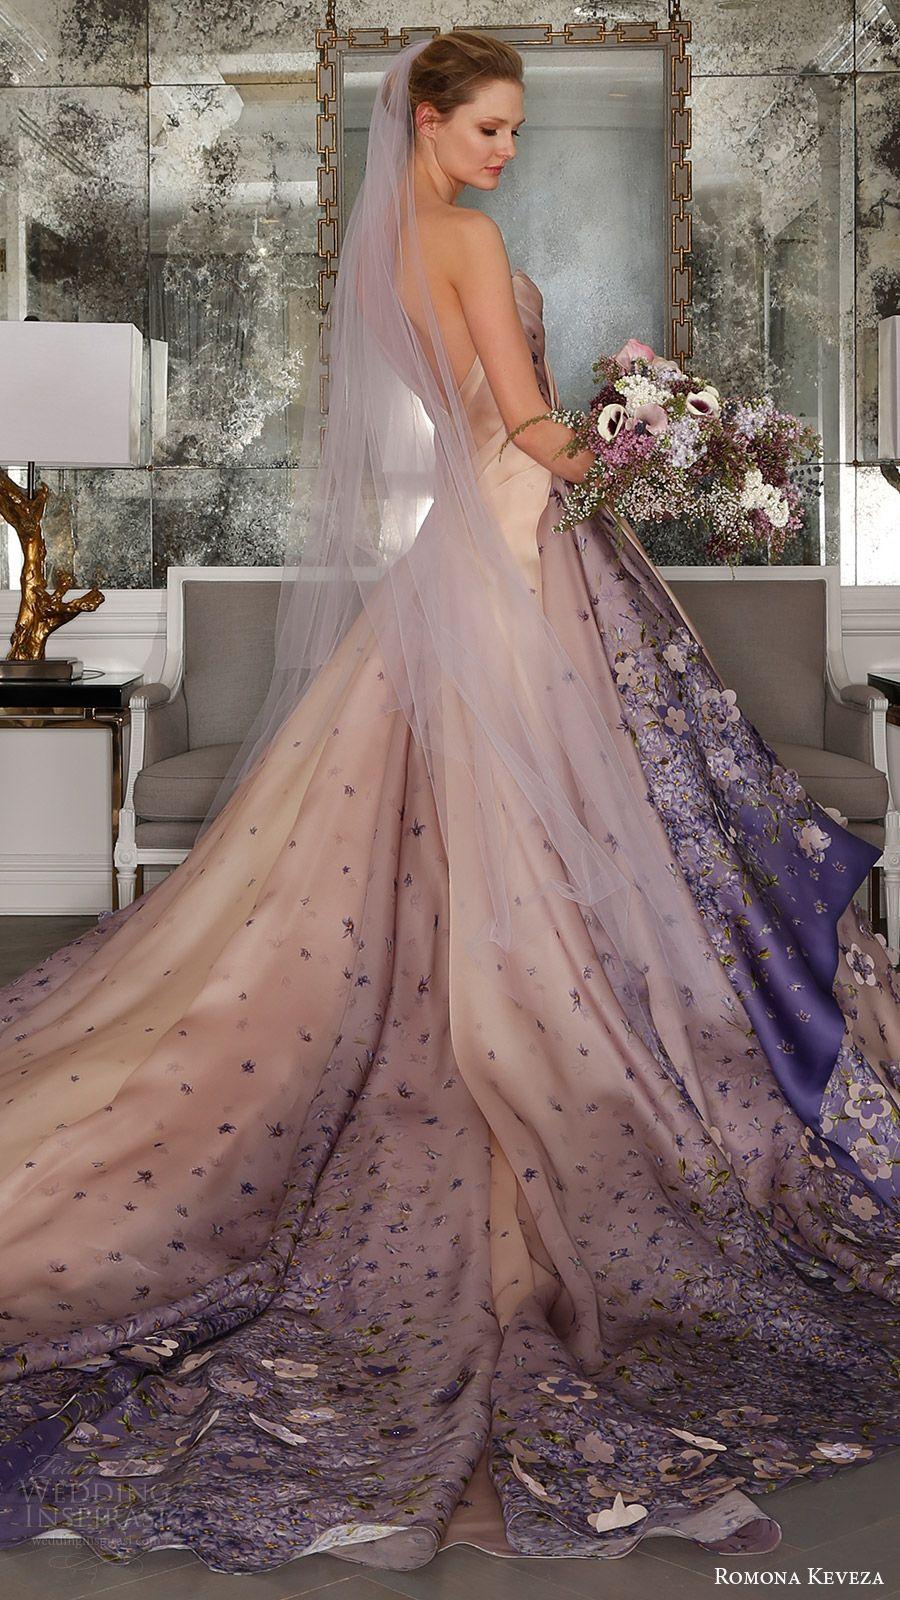 Lovely romona keveza bridal spring one shoulder sweetheart silk organza ball gown wedding dress bv blush color violet print Romona Keveza Spring